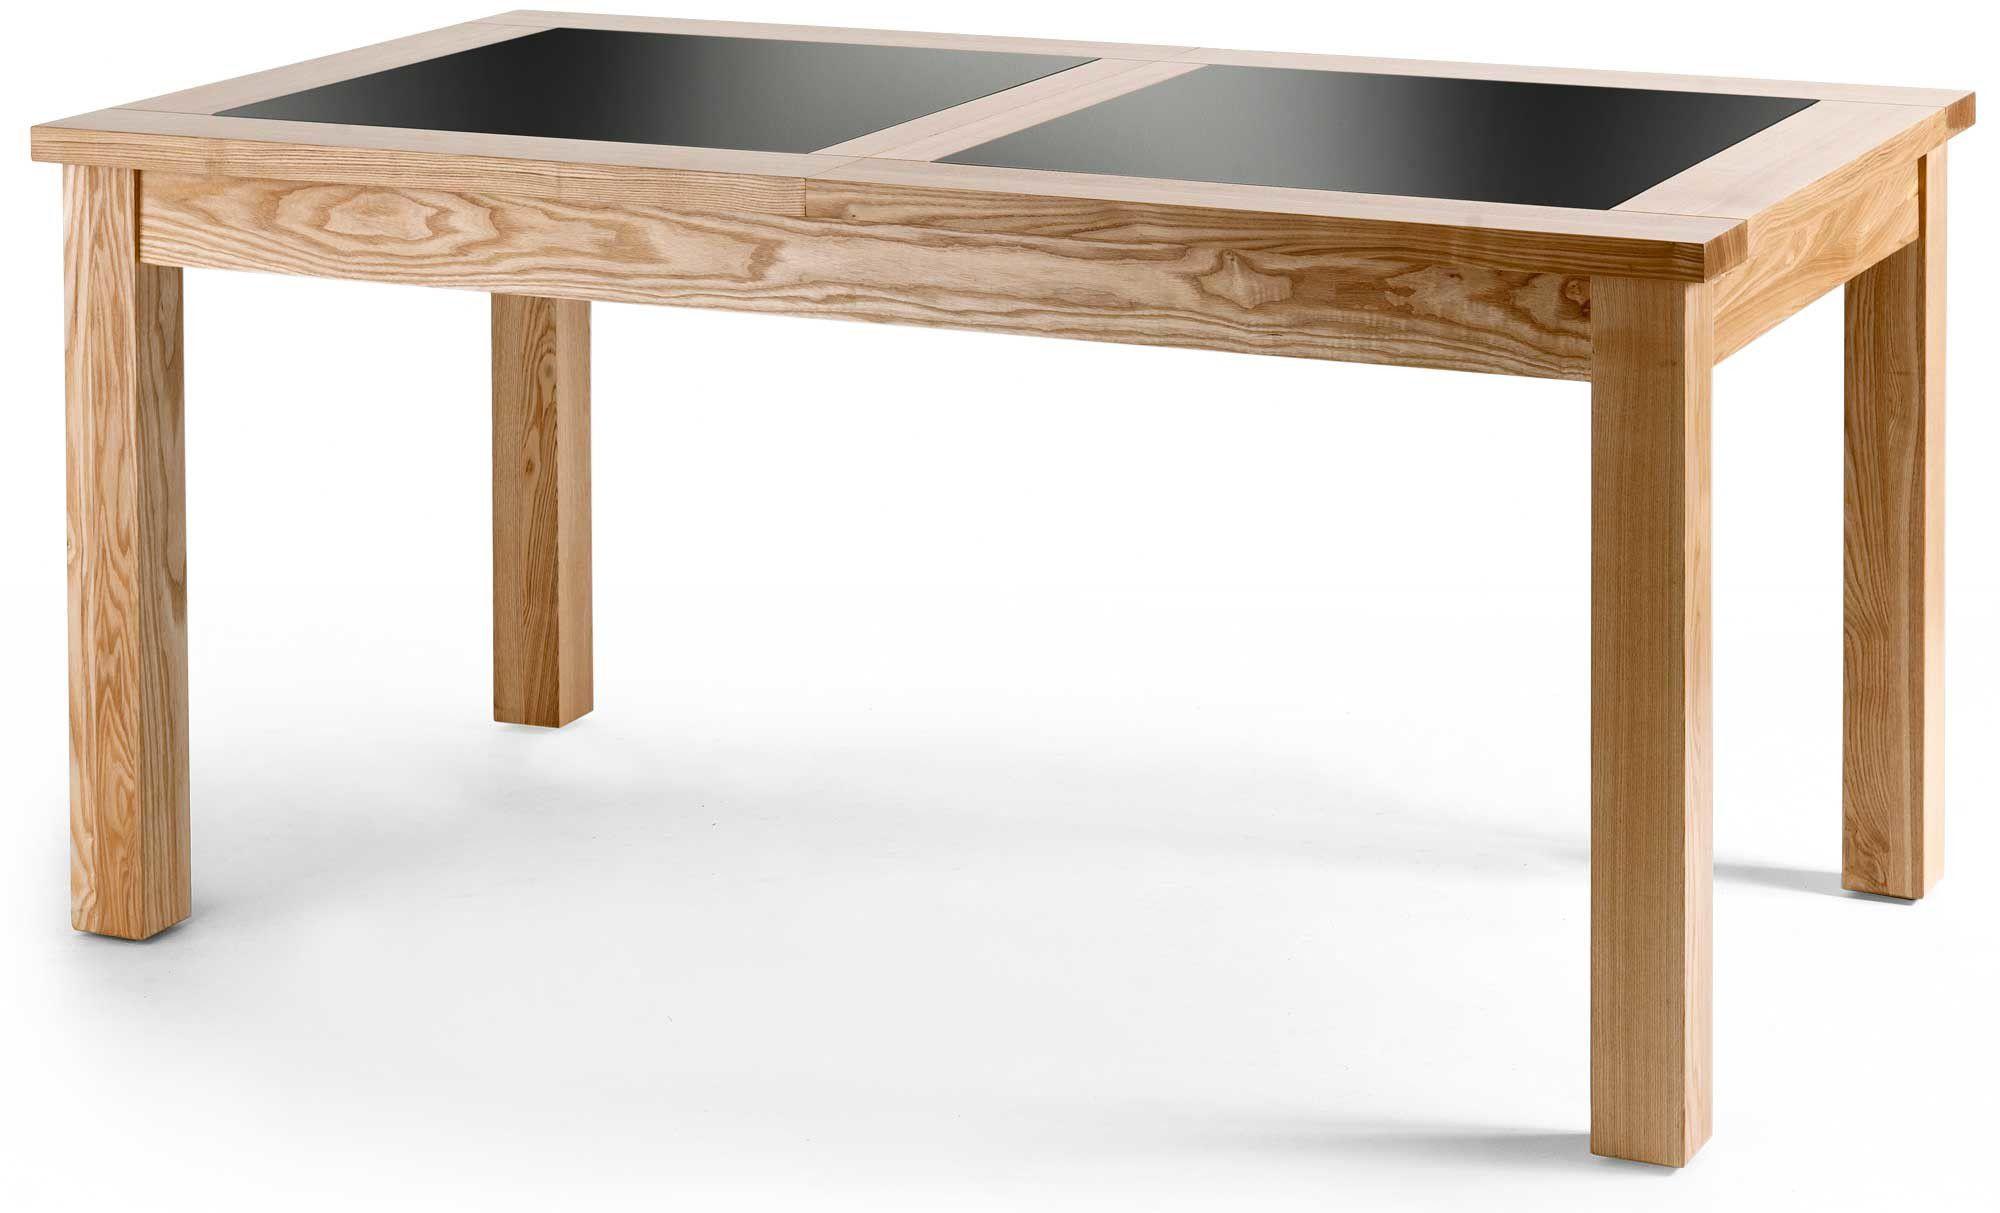 Extending Table 187 Tesco Extending Tables : 181 3602PI1000015MNwid2000amphei2000 from extendingtable.co.uk size 2000 x 2000 jpeg 155kB